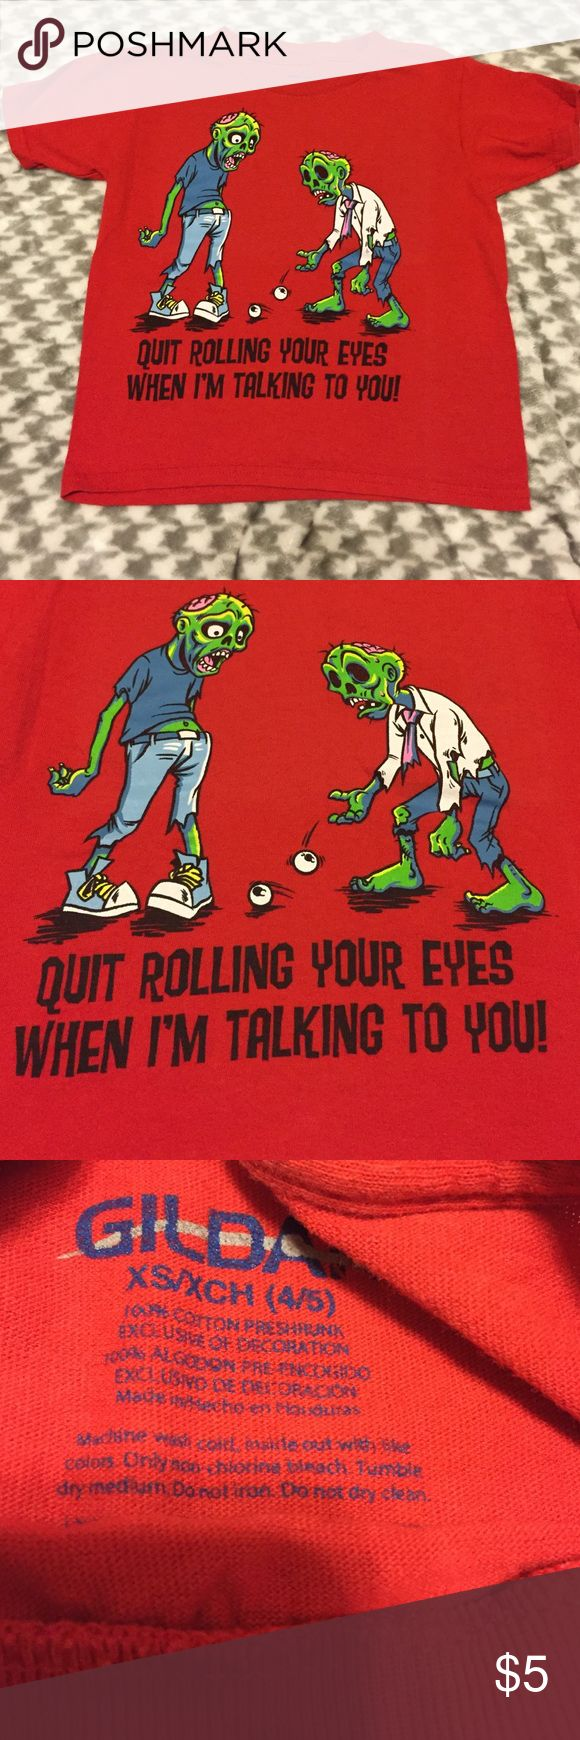 Boys Zombie Shirt Size xs boys zombie short sleeve shirt Gildan Shirts & Tops